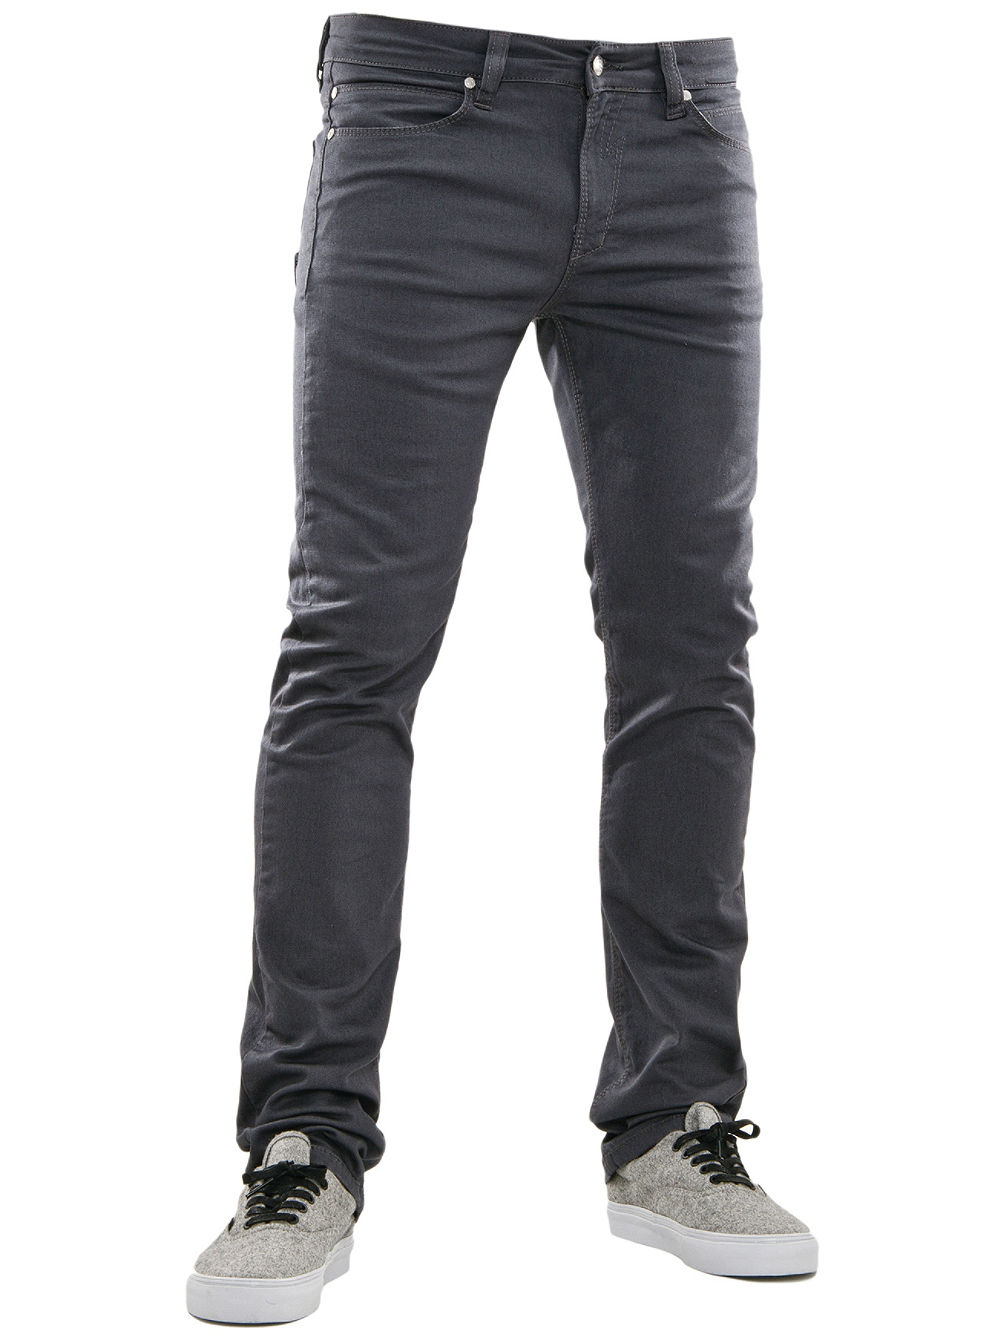 reell skin 2 jeans online kaufen bei blue. Black Bedroom Furniture Sets. Home Design Ideas